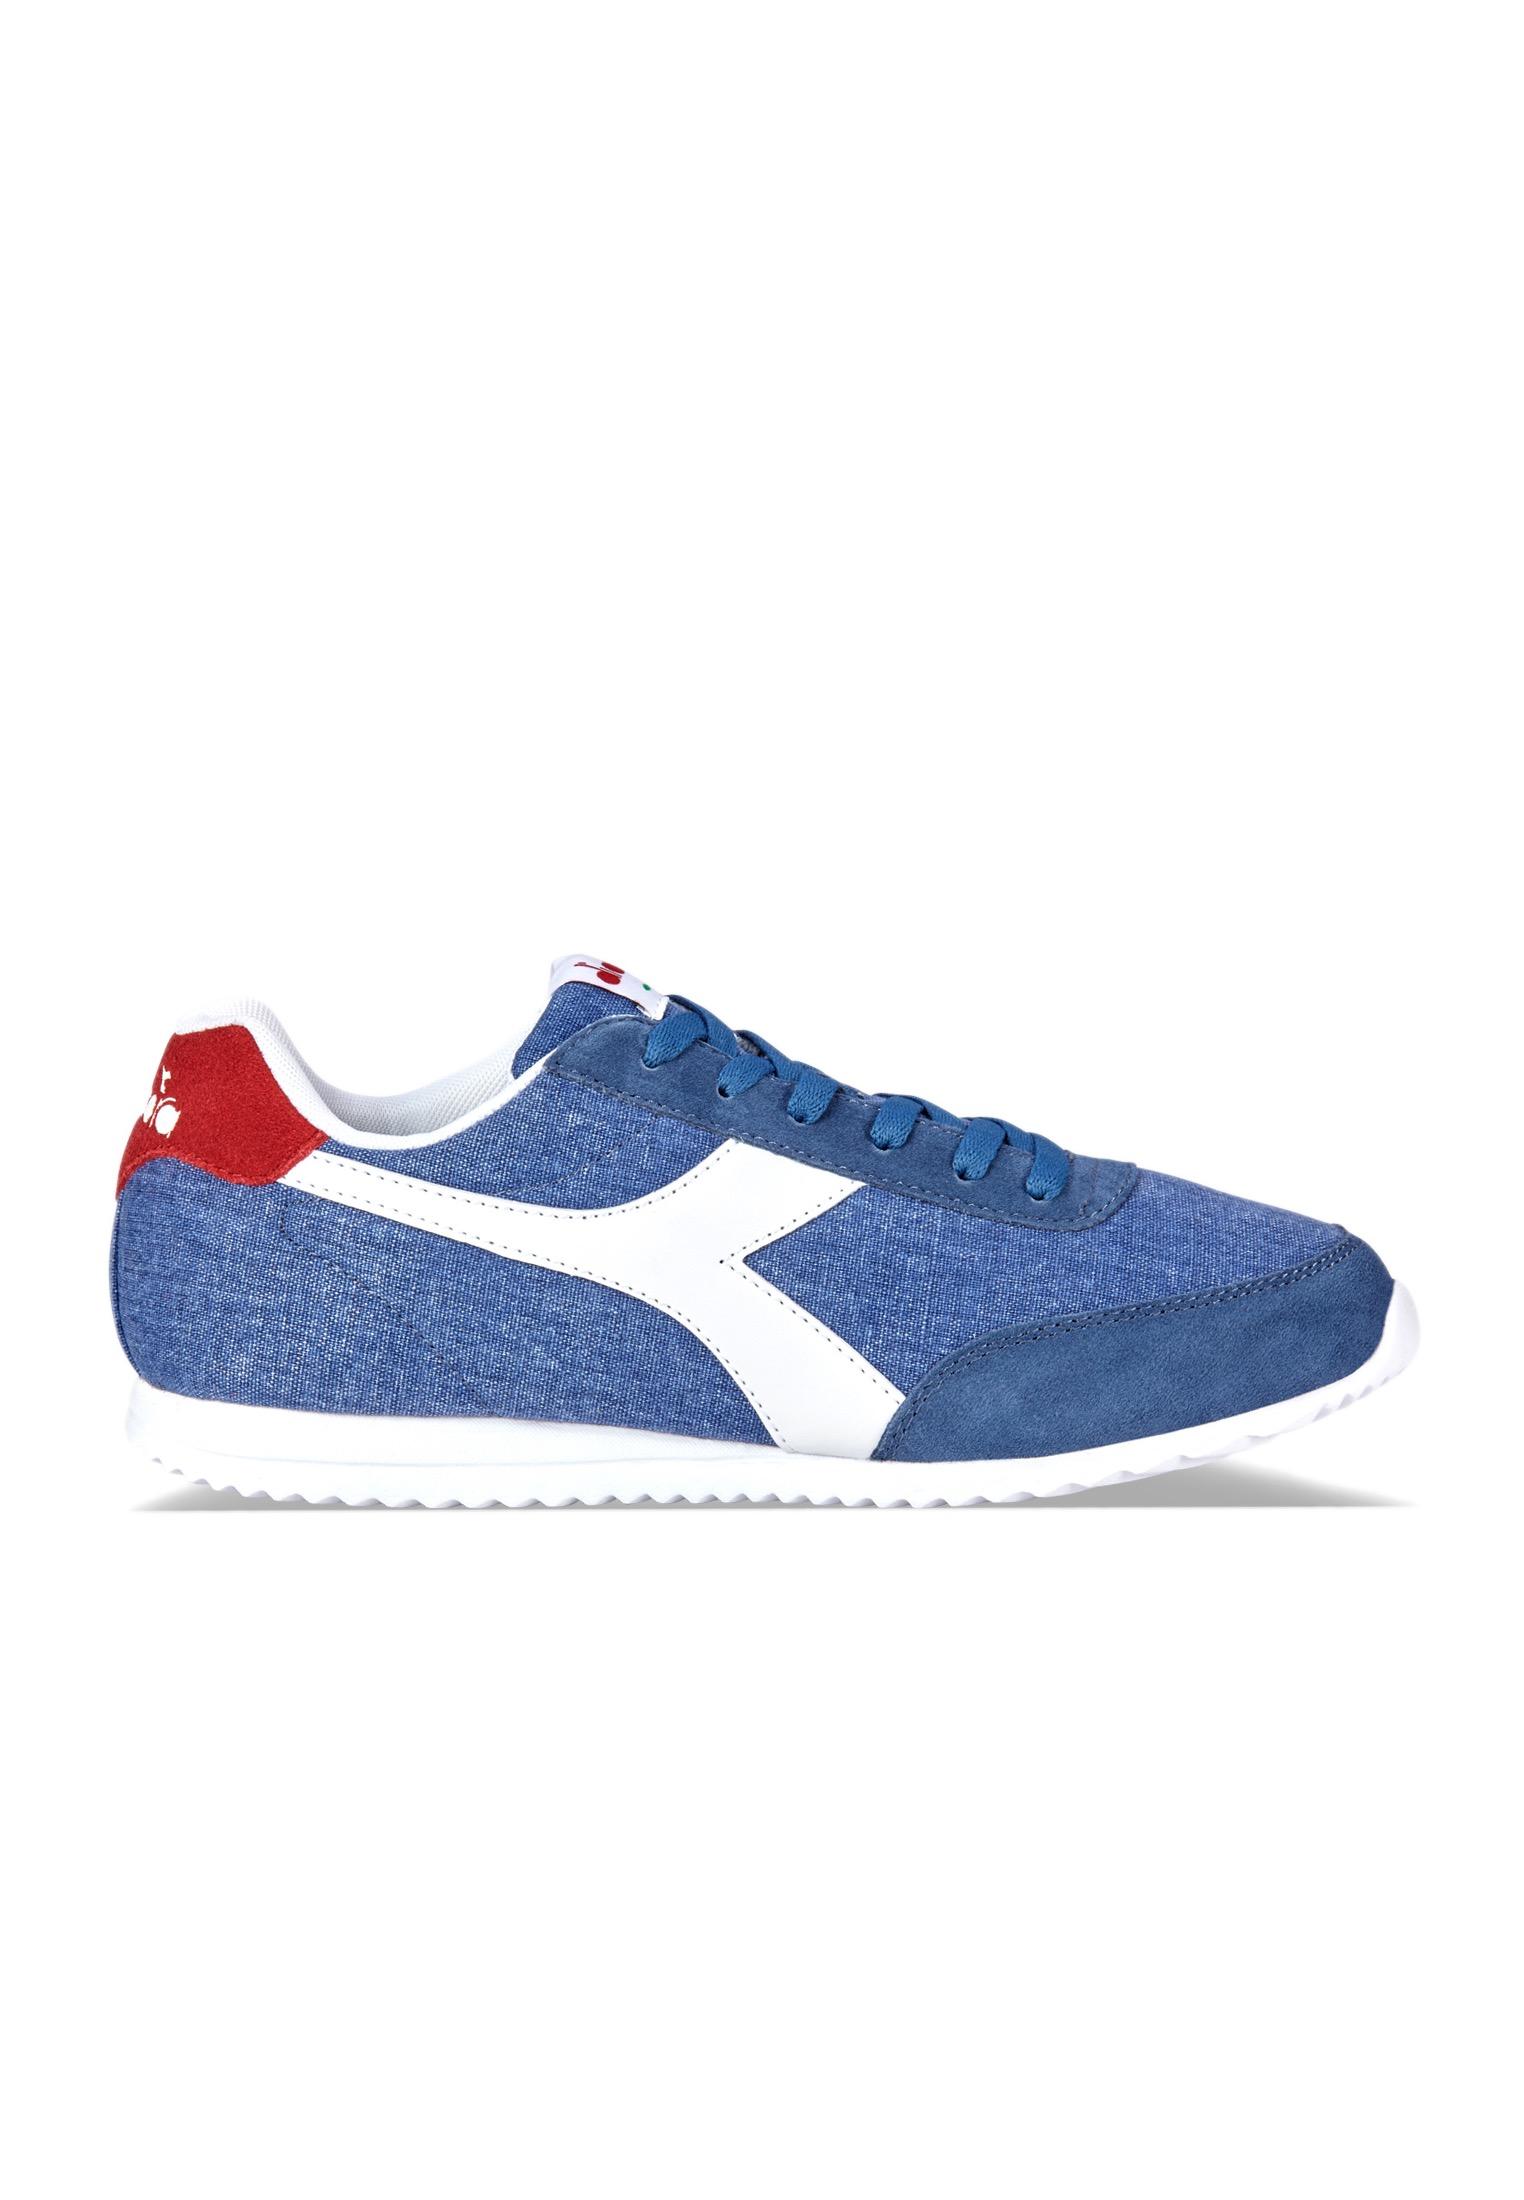 Scarpe-Diadora-Jog-Light-C-Sneakers-sportive-uomo-donna-vari-colori-e-taglie miniatura 37